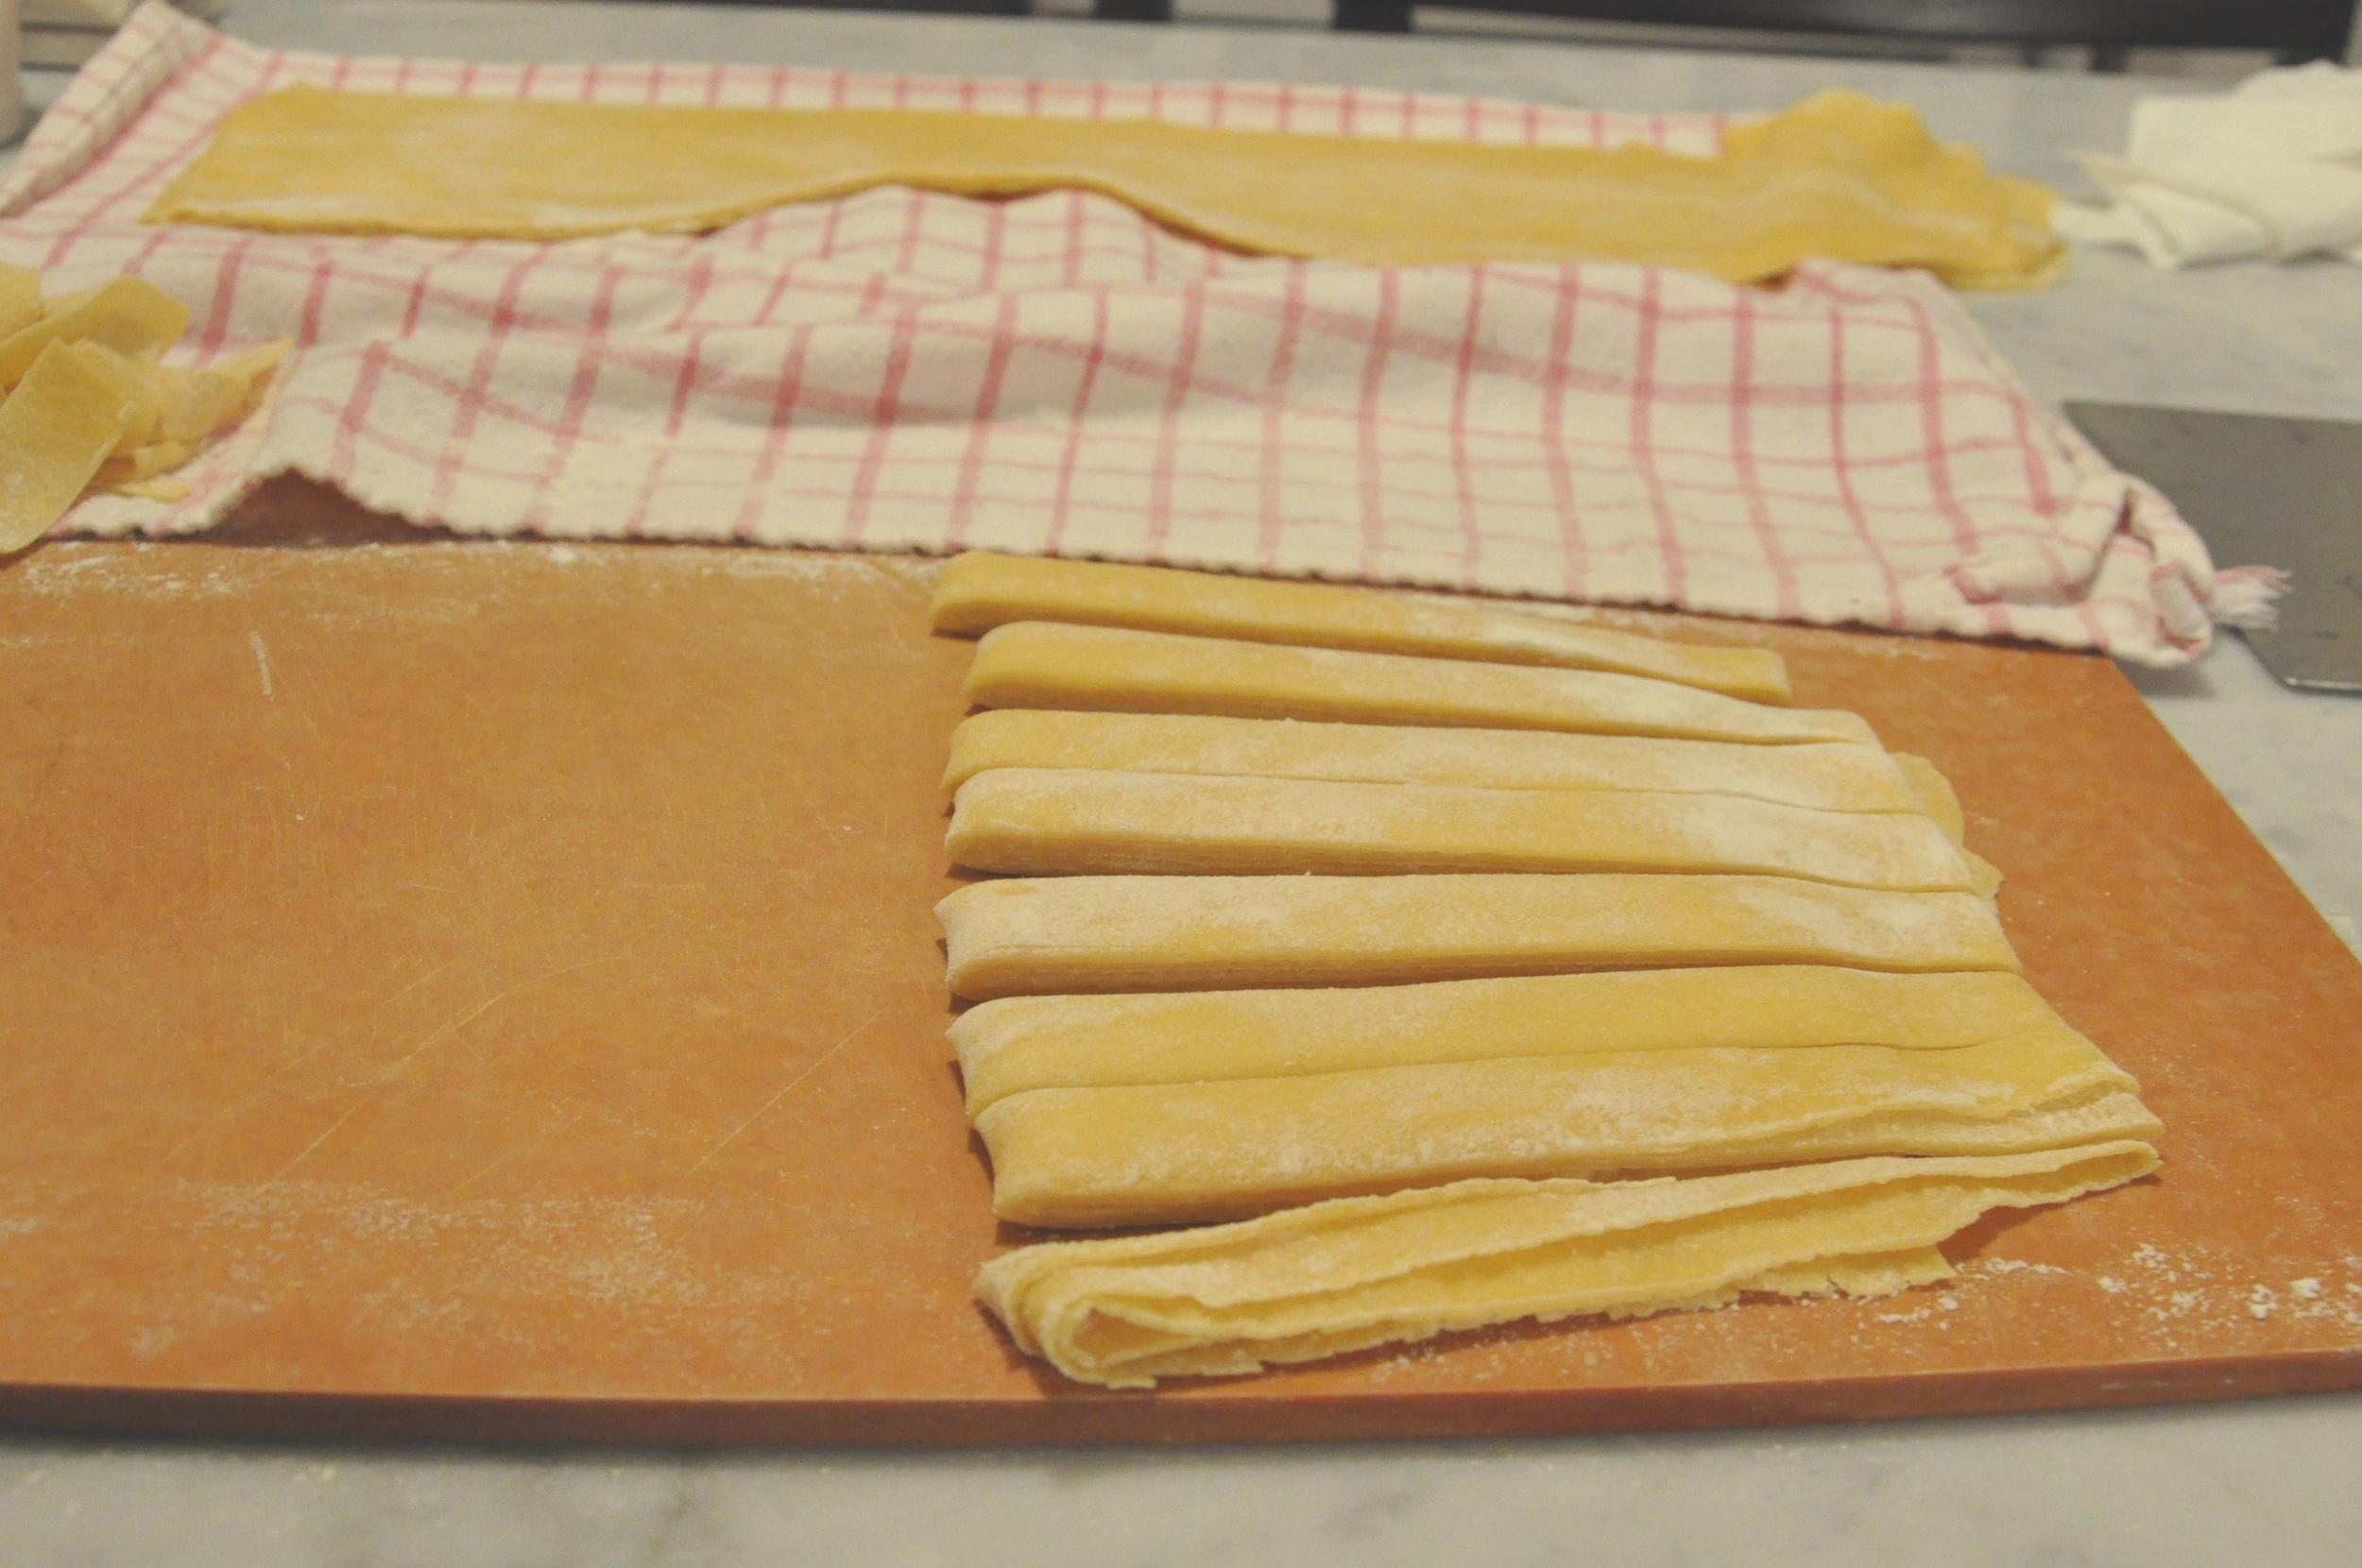 cutting_pasta2_cns.jpg